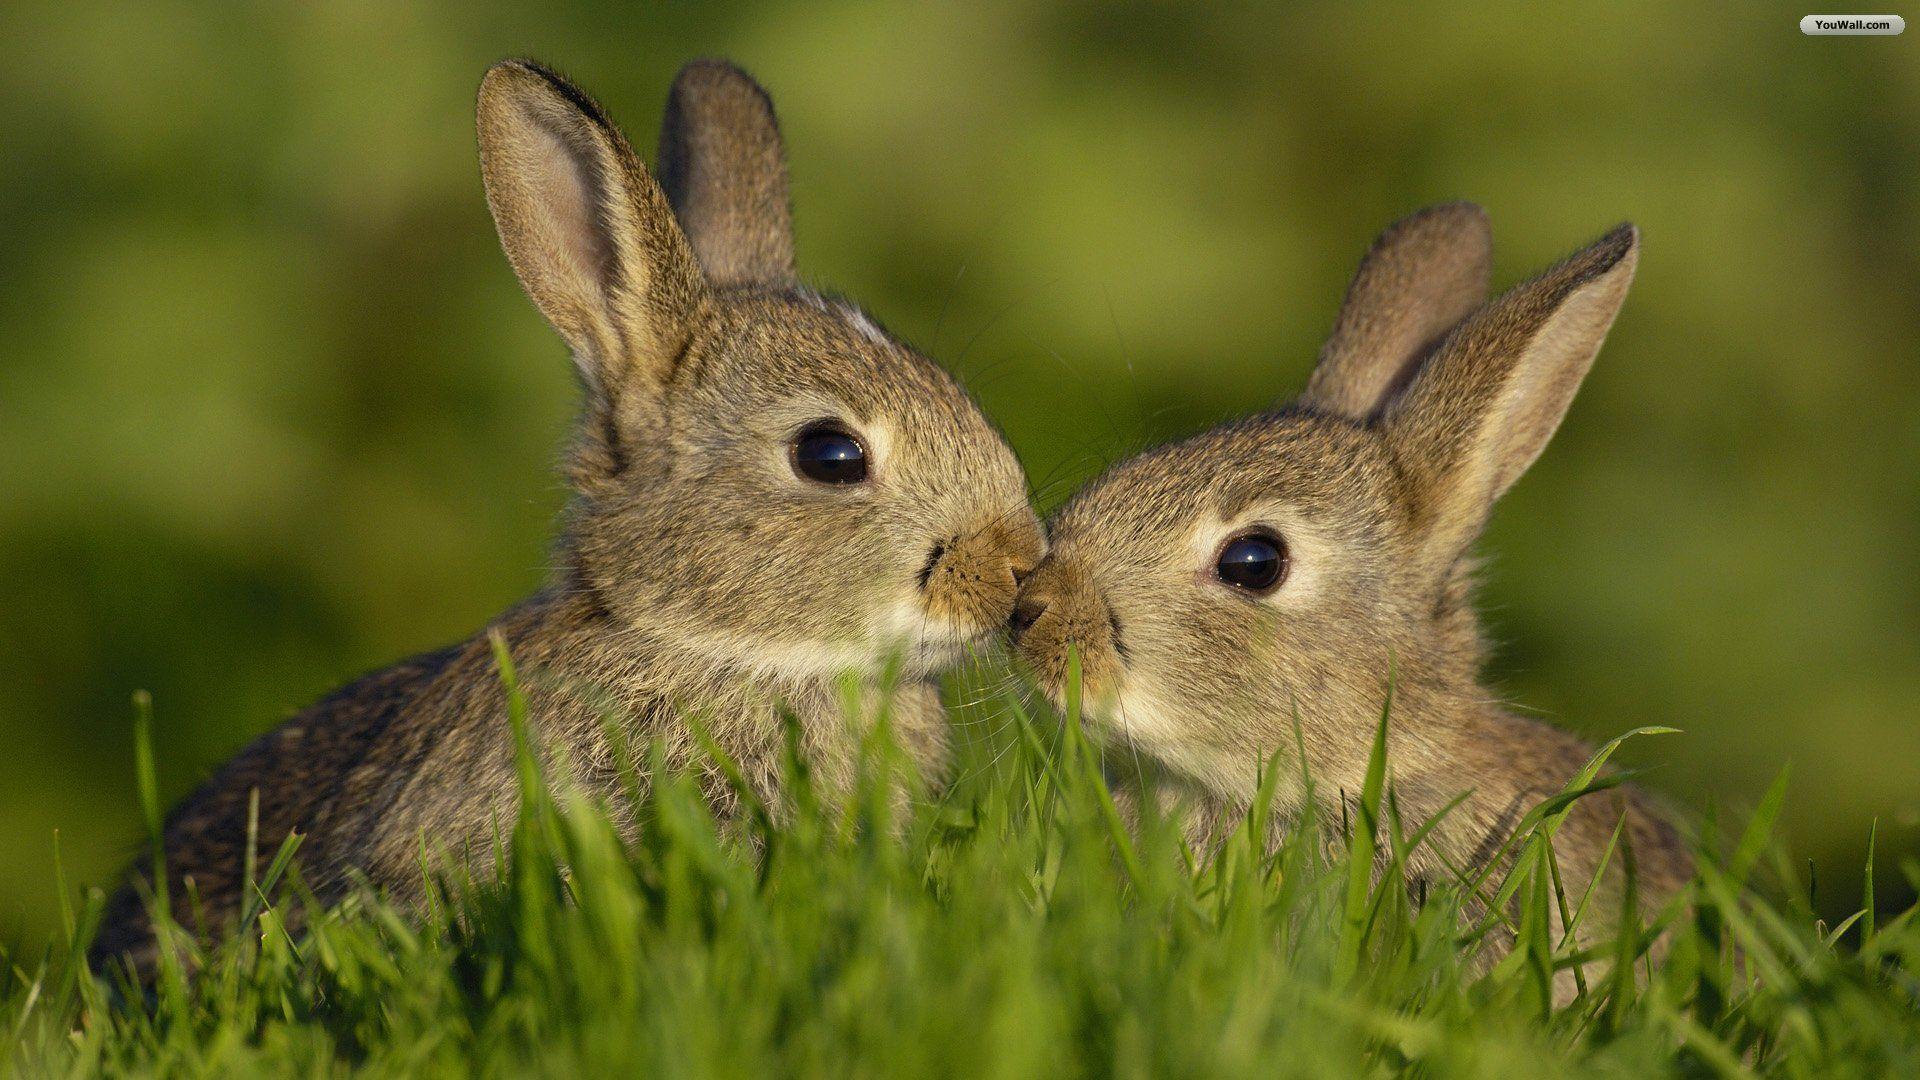 Bunny screen wallpaper